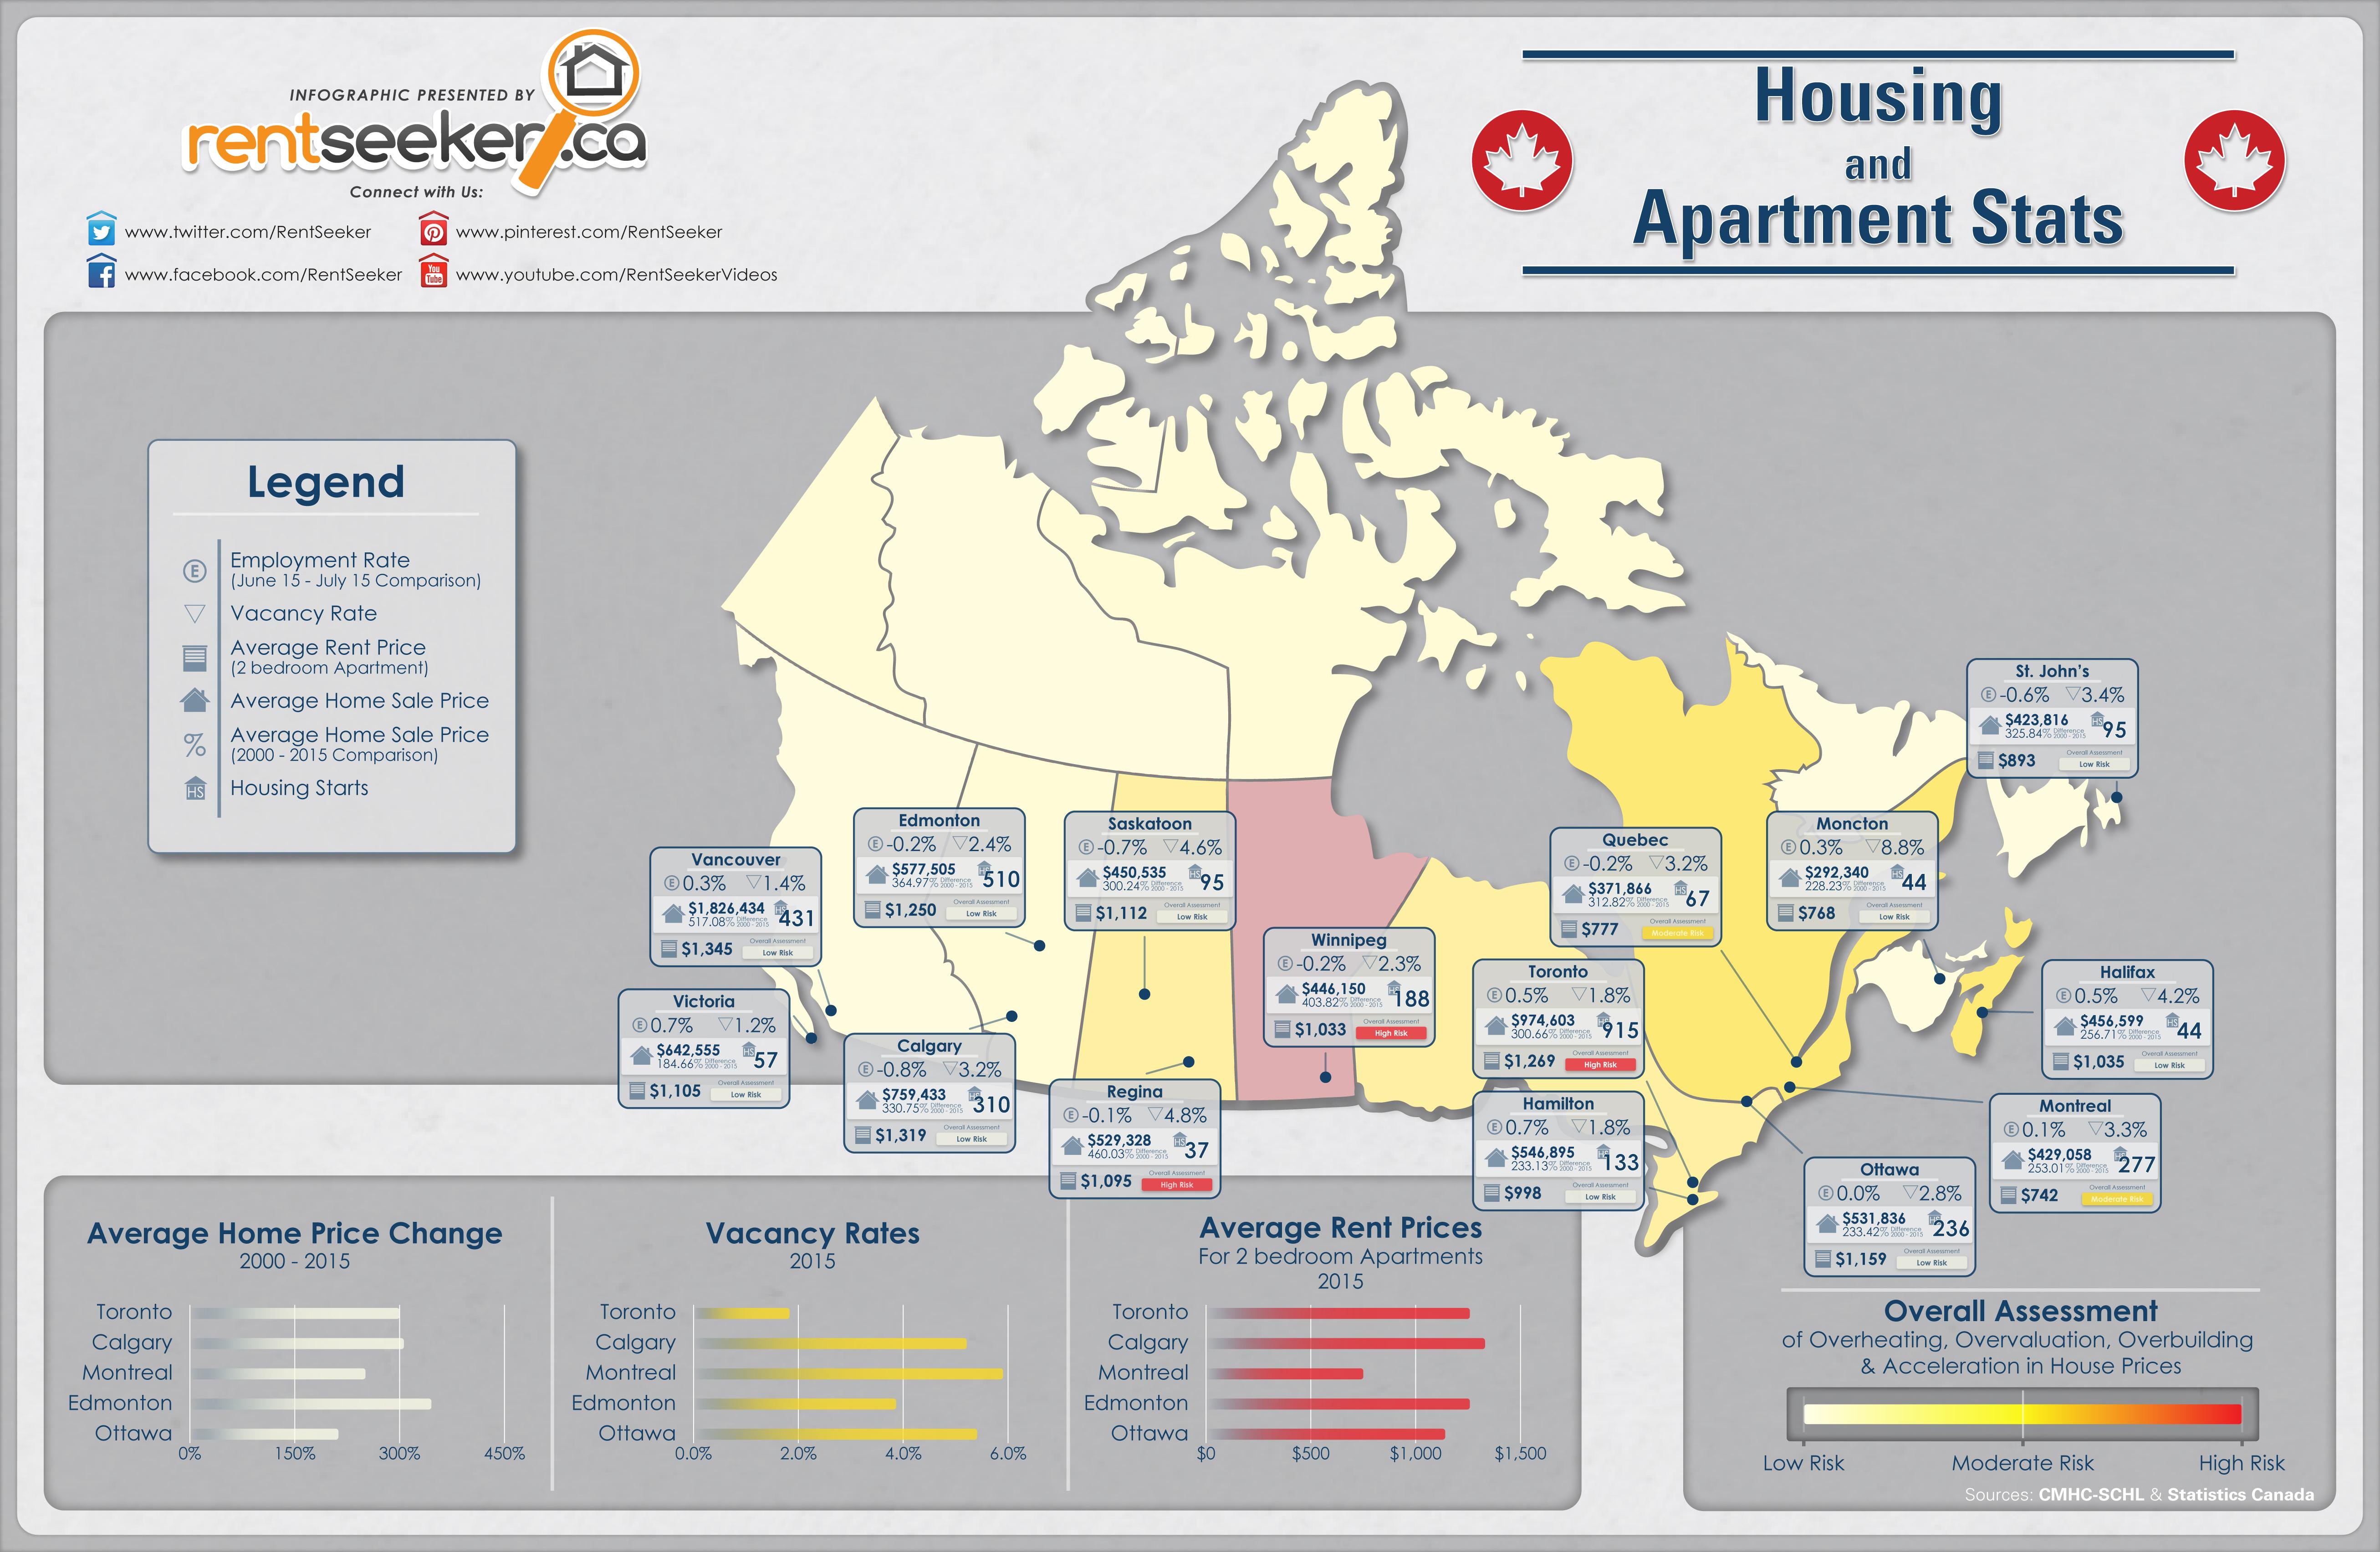 CMHC 2015 Housing and Rental Stats - RentSeeker.ca